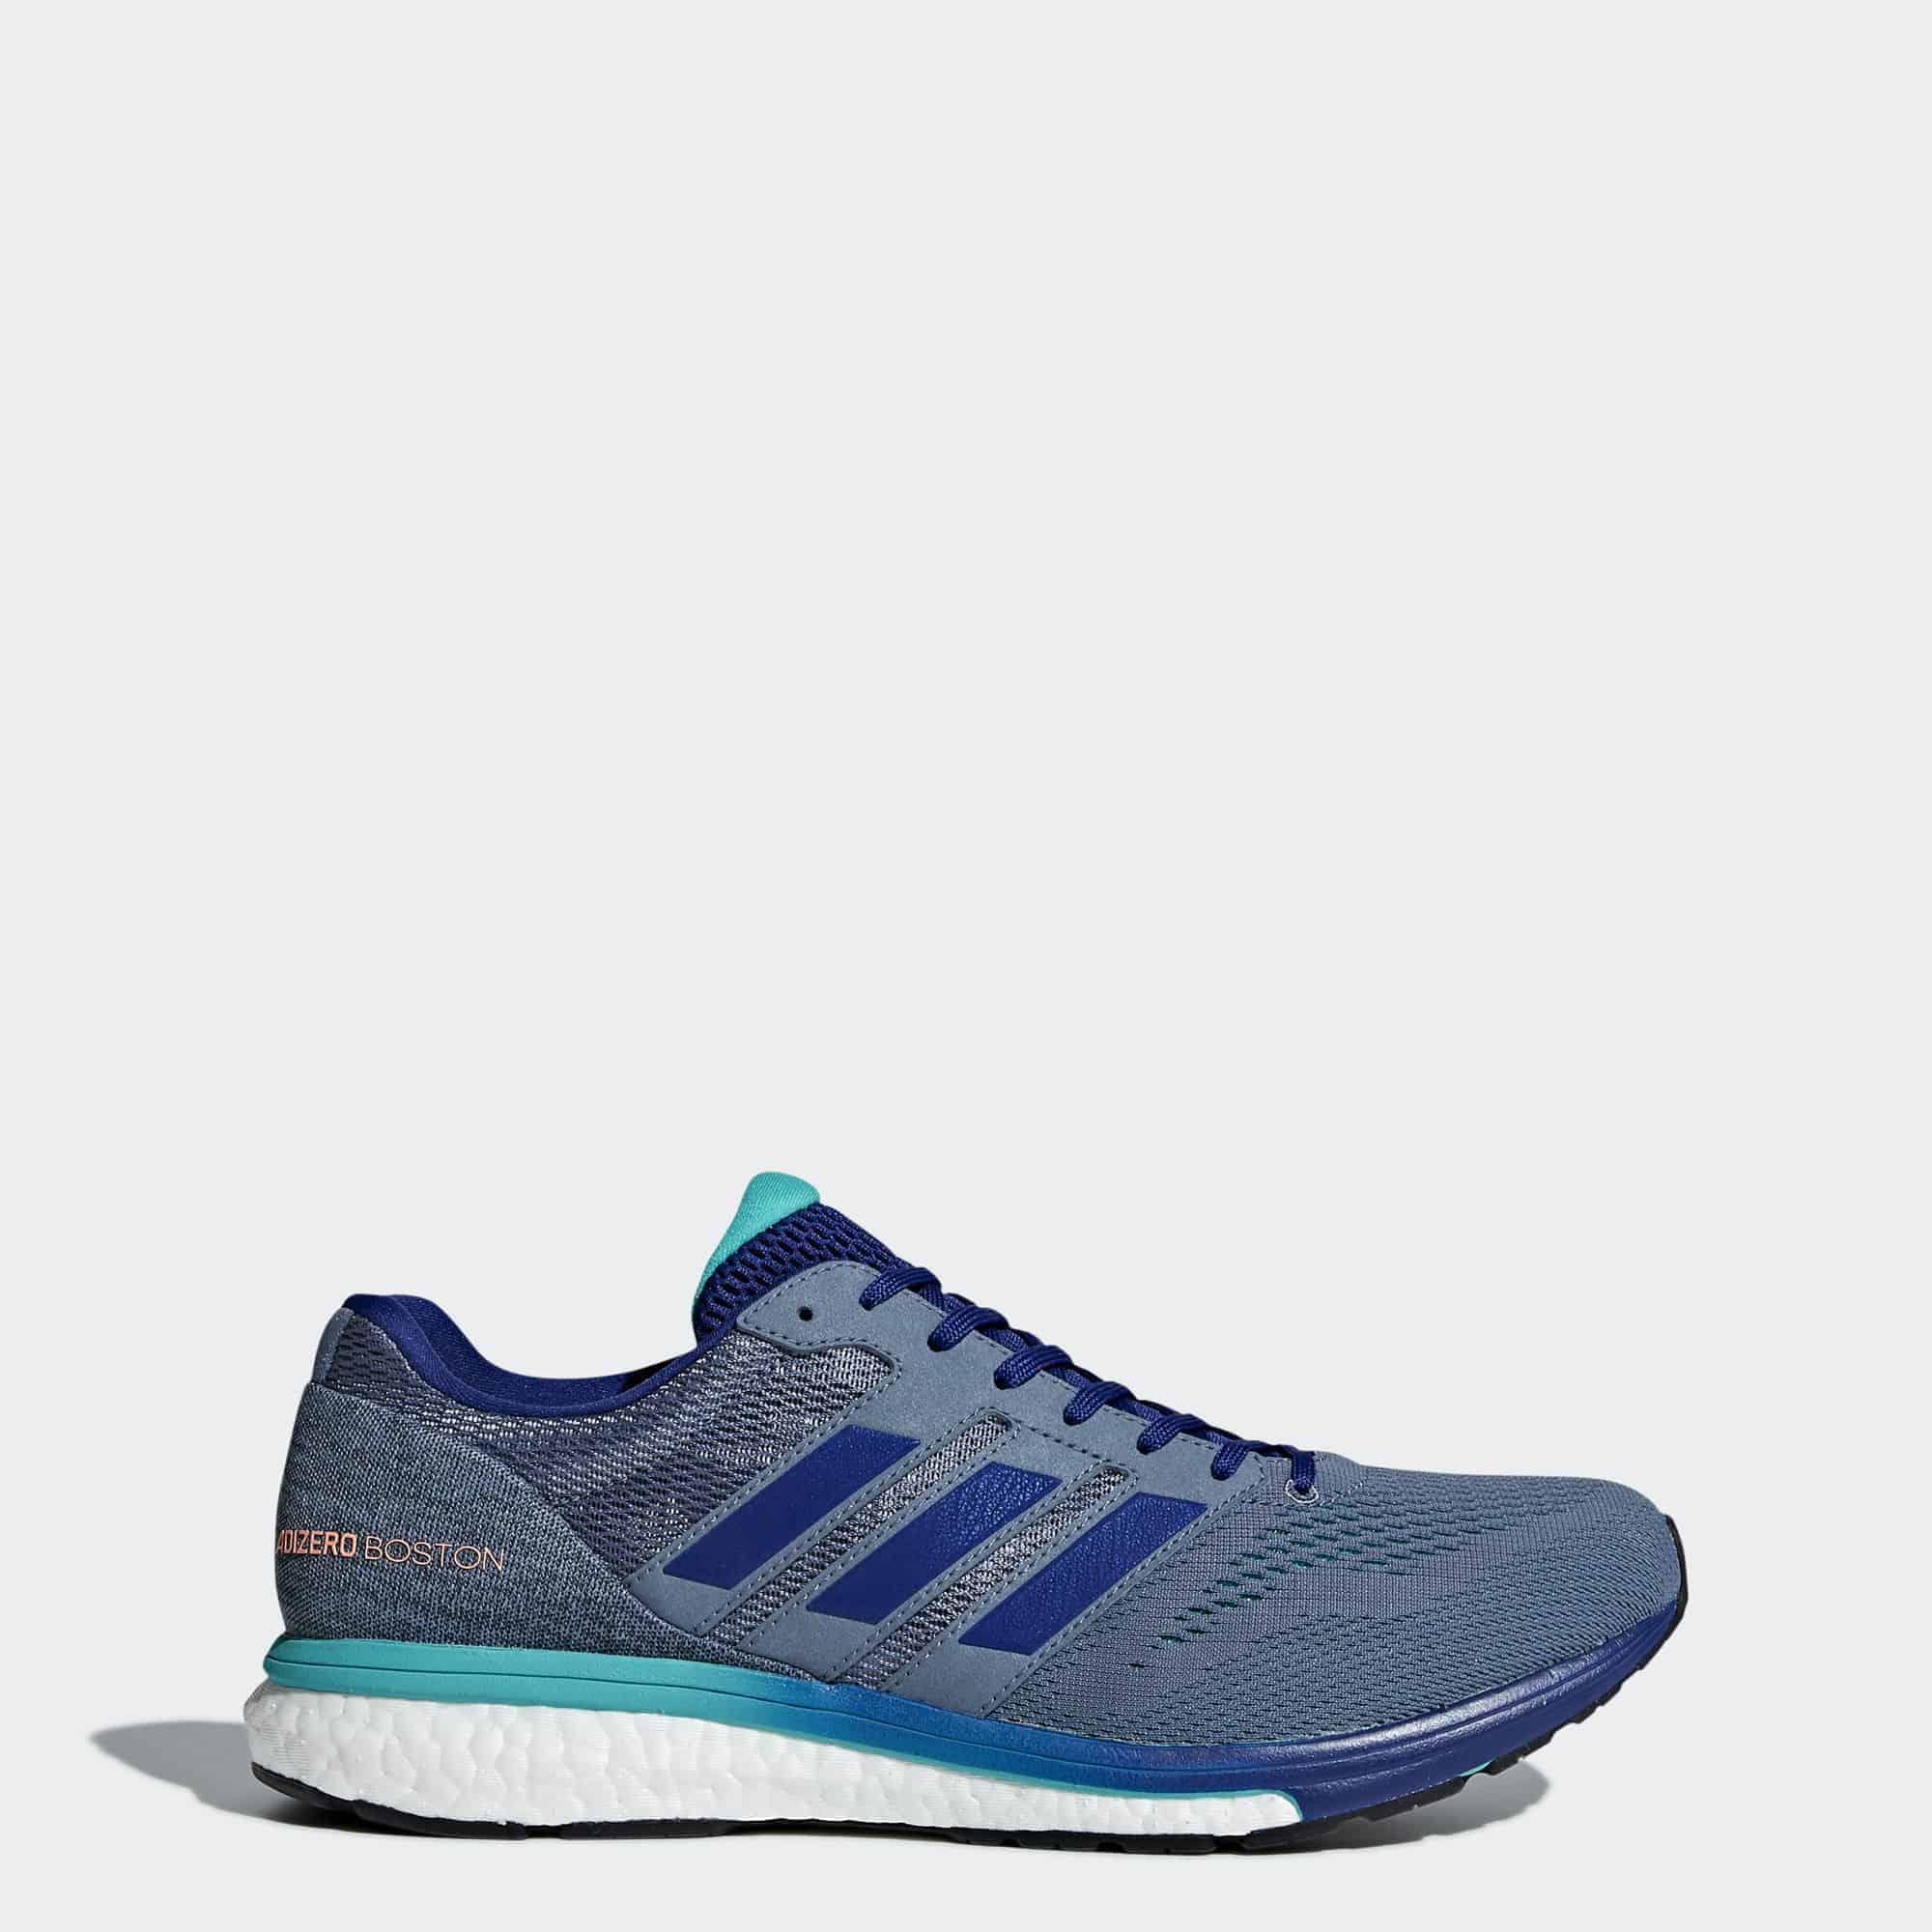 Кроссовки для бега Adidas Adizero Boston 7 мужские